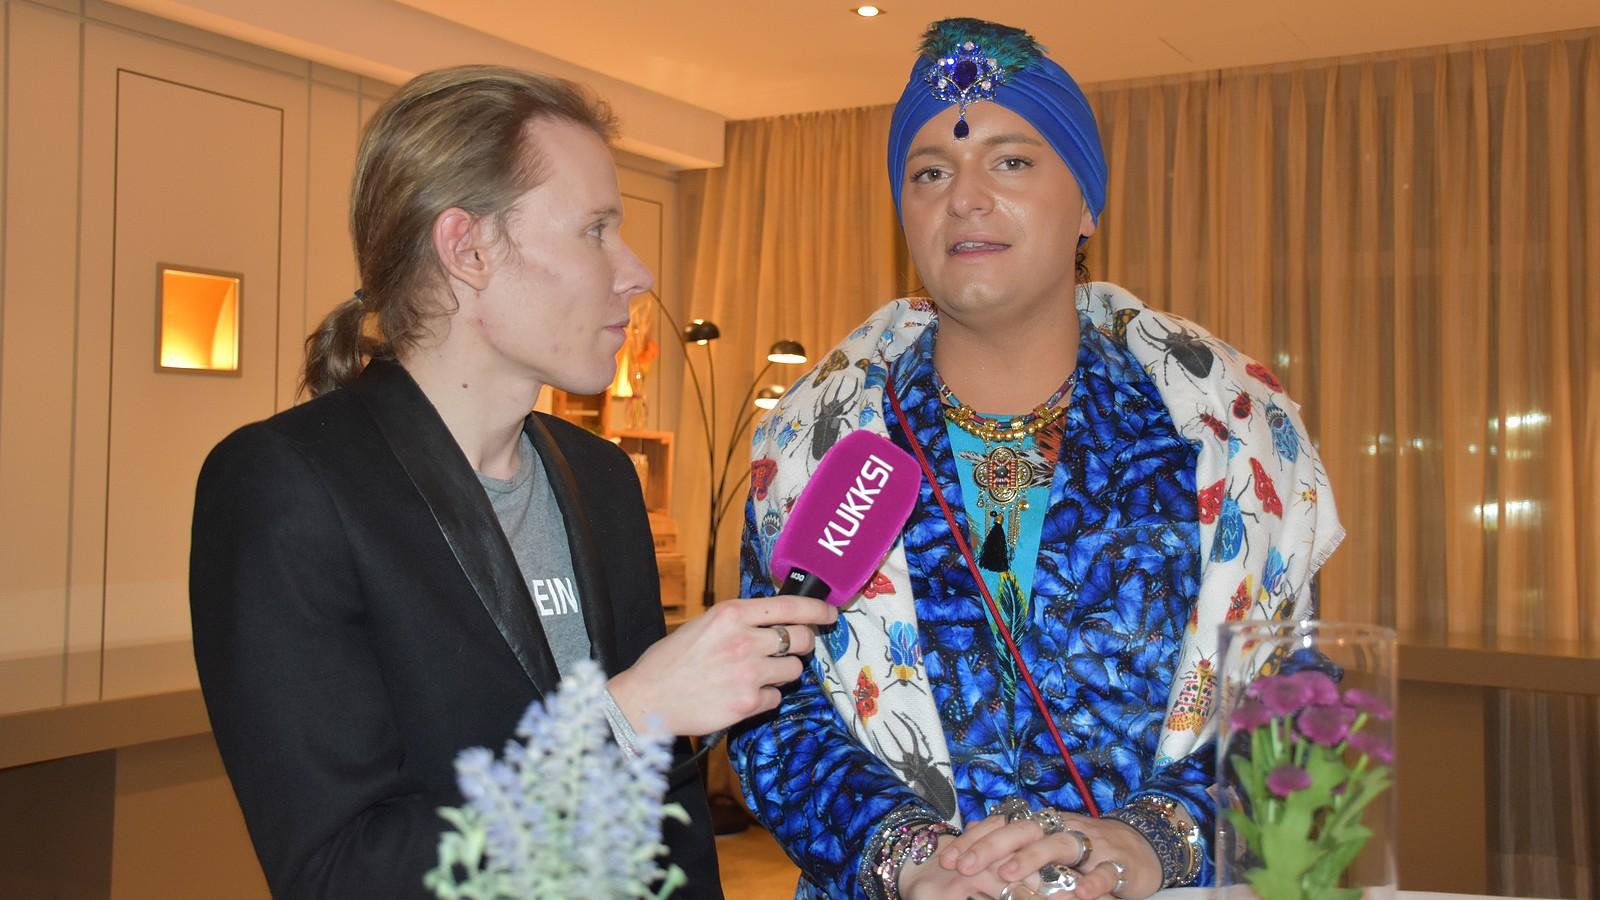 Julian F.M. Stoeckel im Interview mit KUKKSI